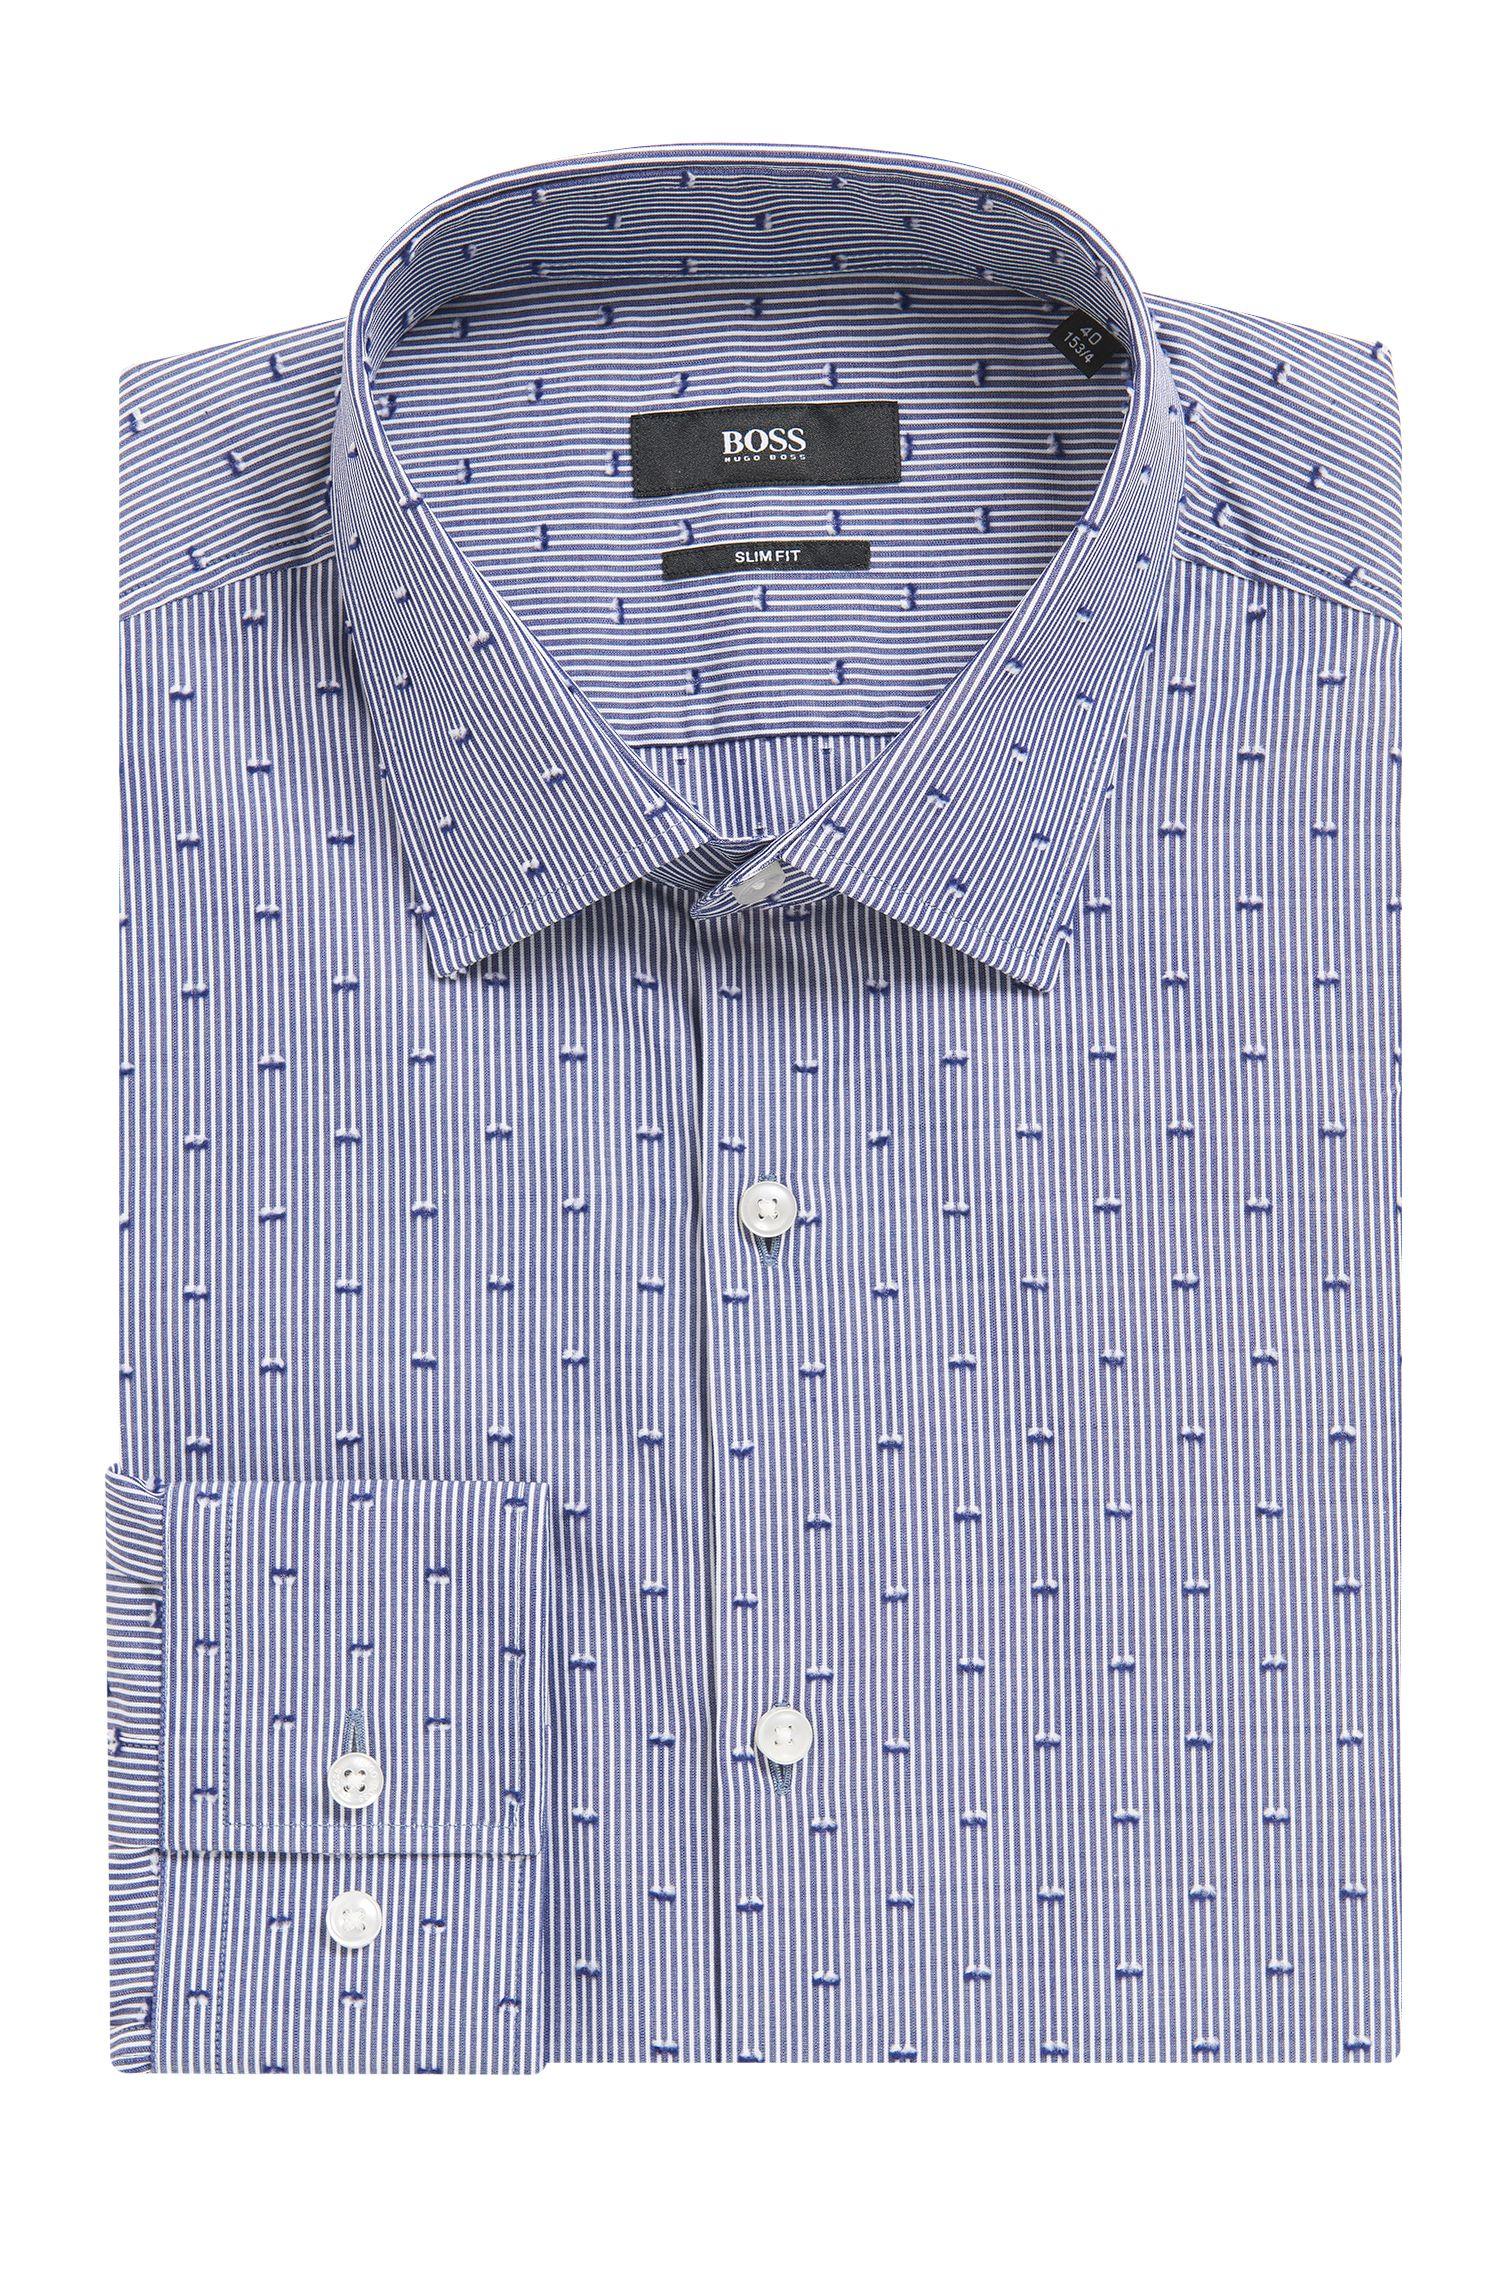 Jenno' | Slim Fit, Cotton Dress Shirt